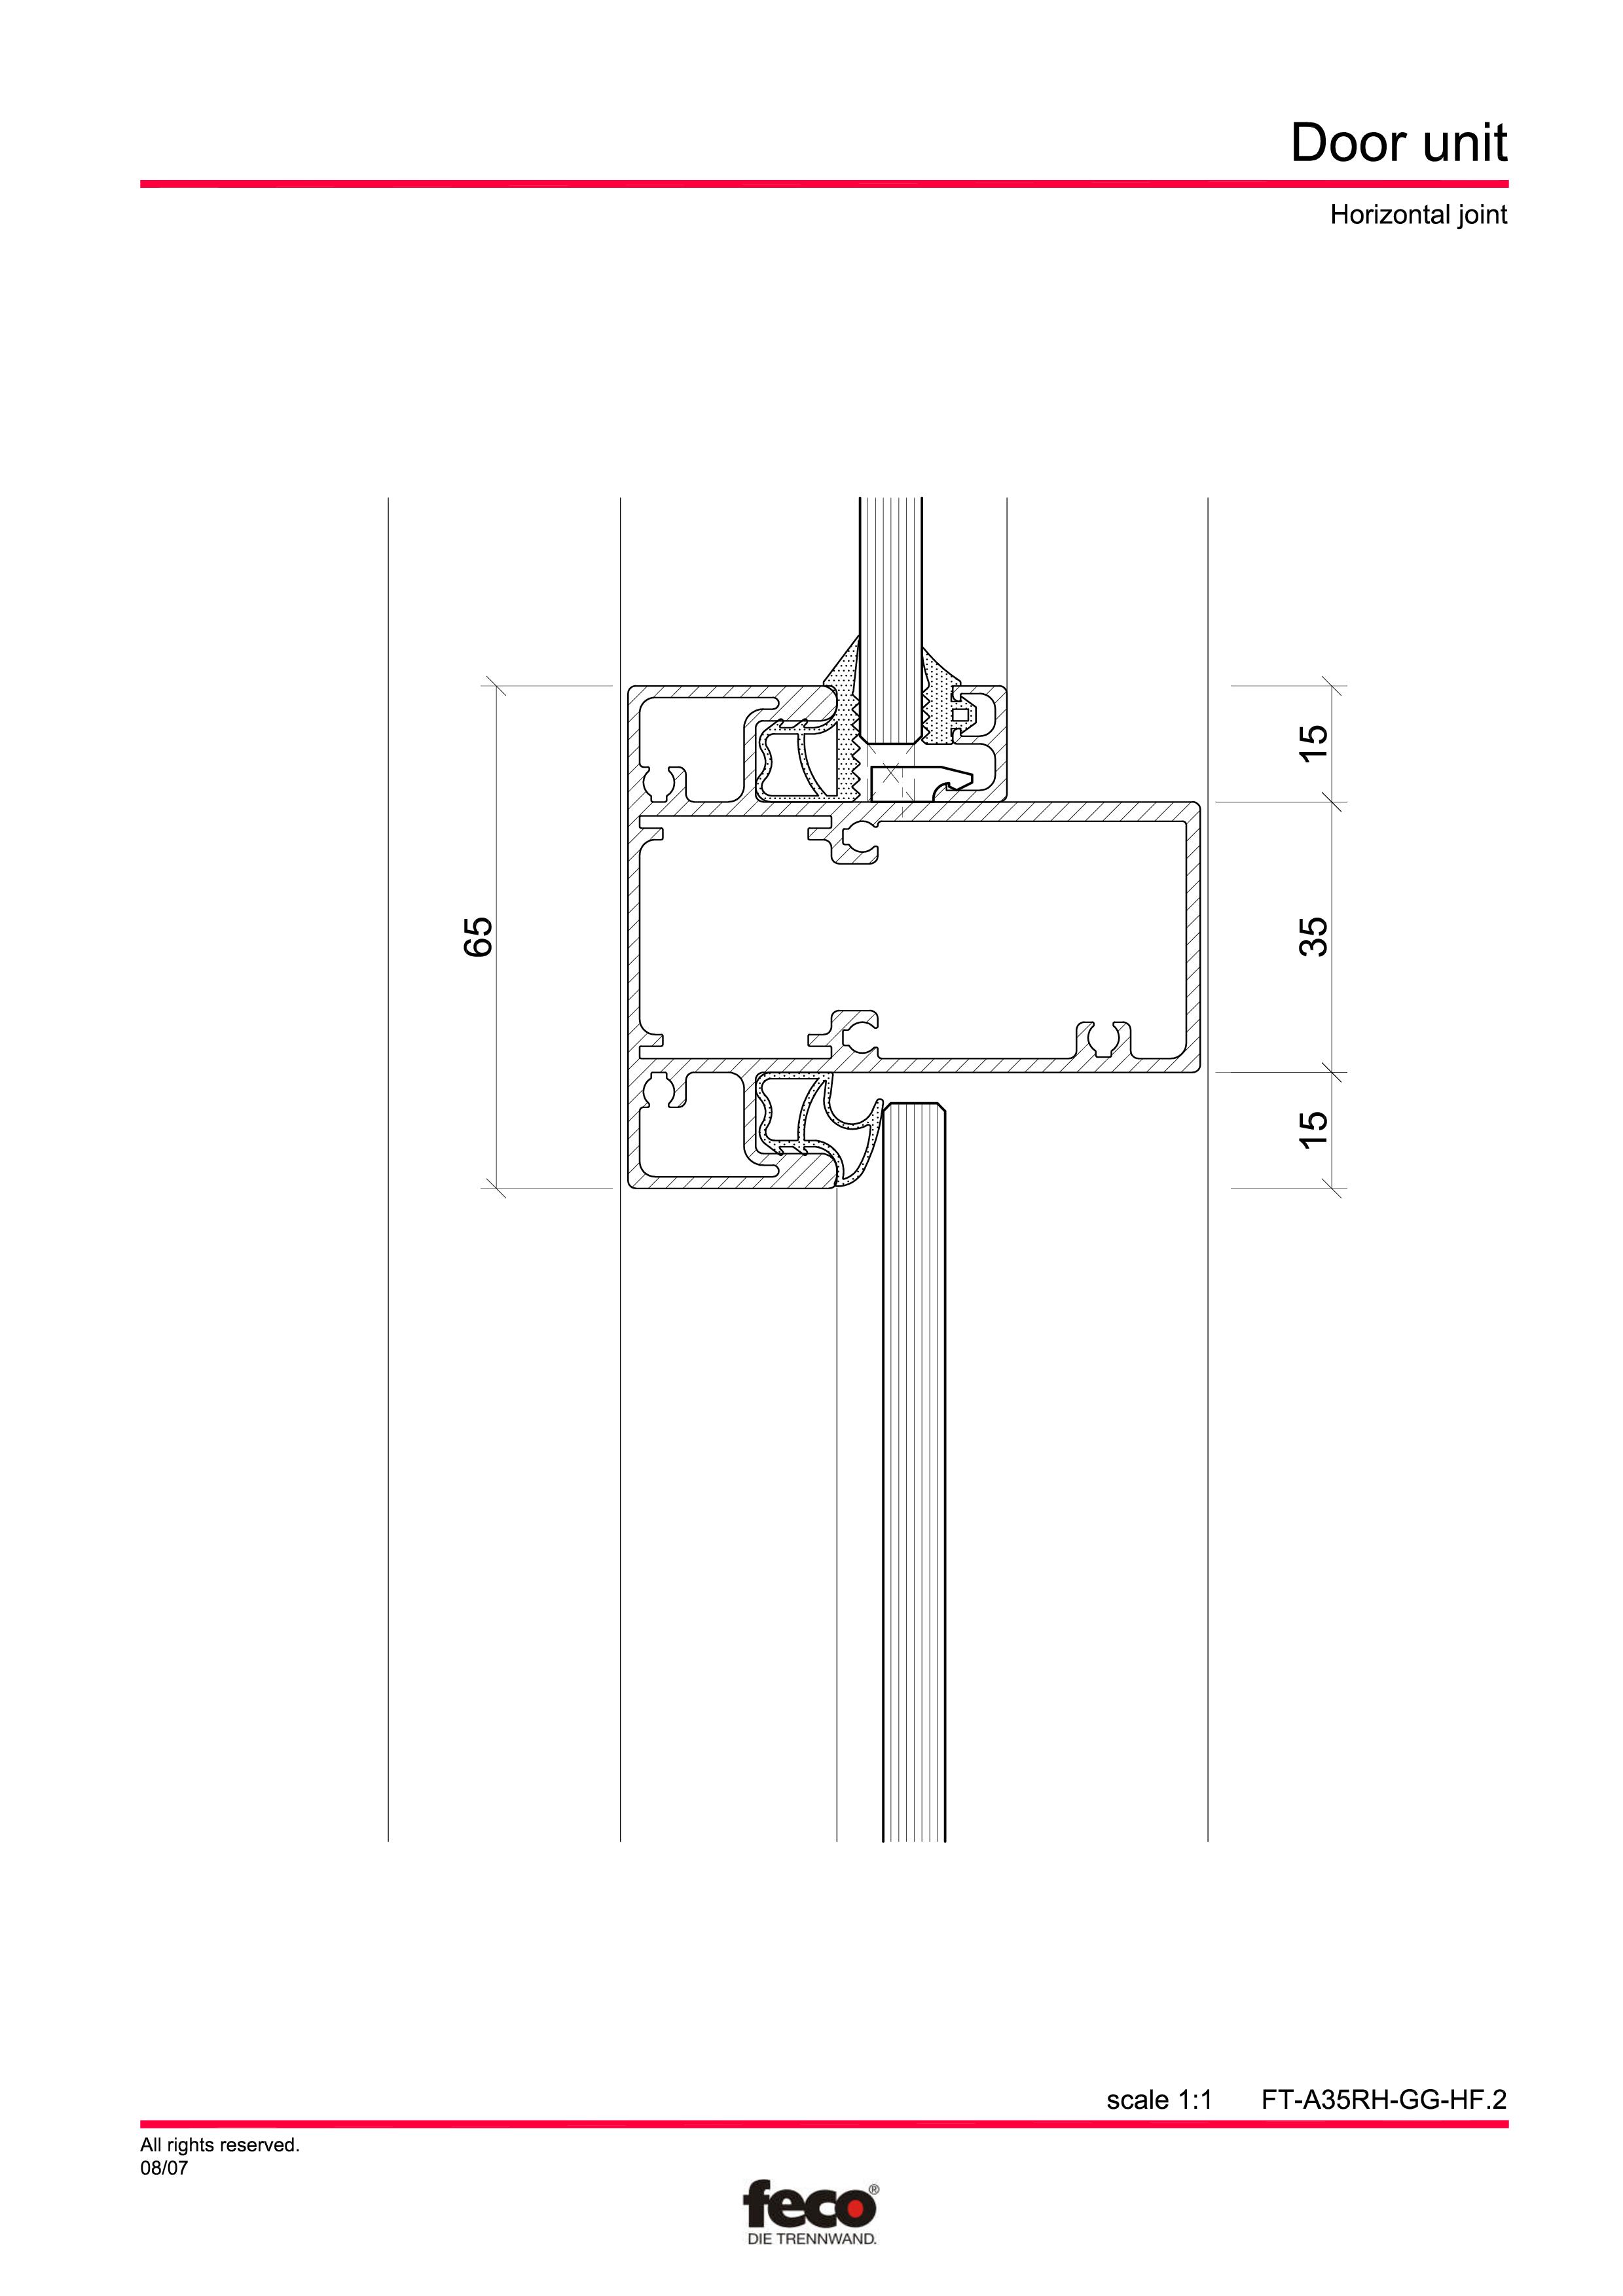 Pagina 6 - CAD-PDF Usa de sticla (pana la planseu) FECO Detaliu de montaj